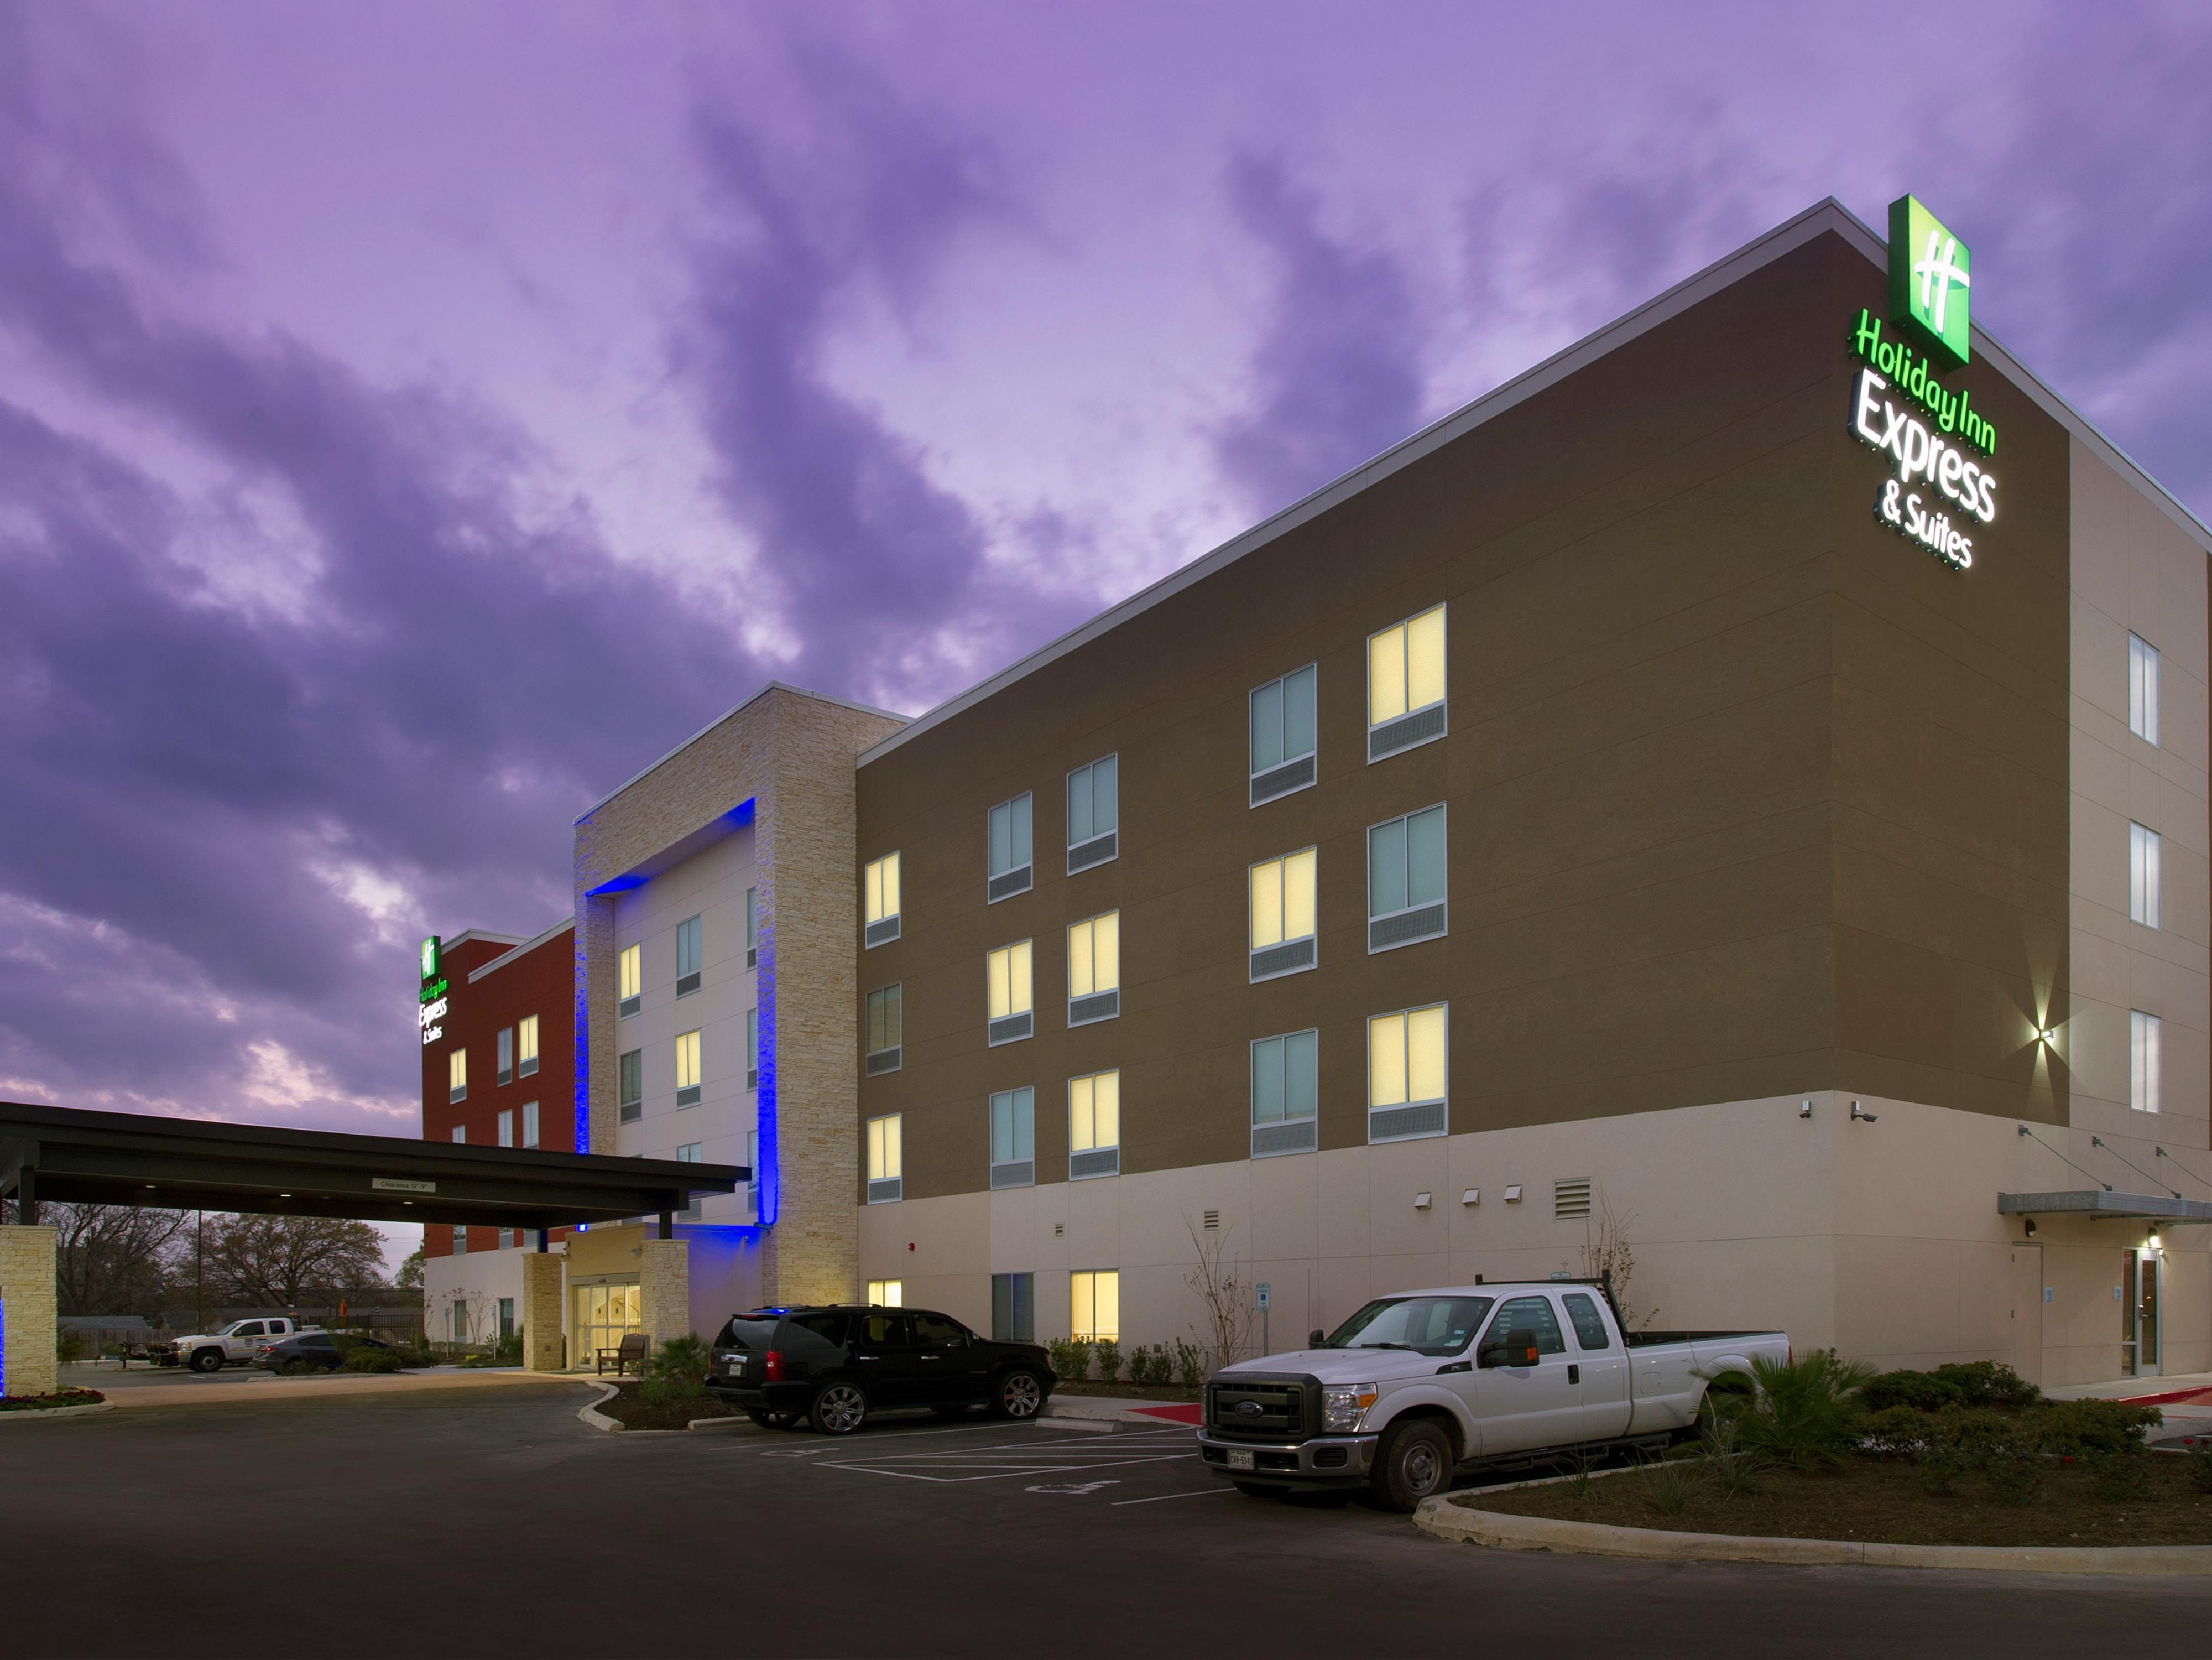 New Braunfels Texas Hotel 2018 World 39 S Best Hotels